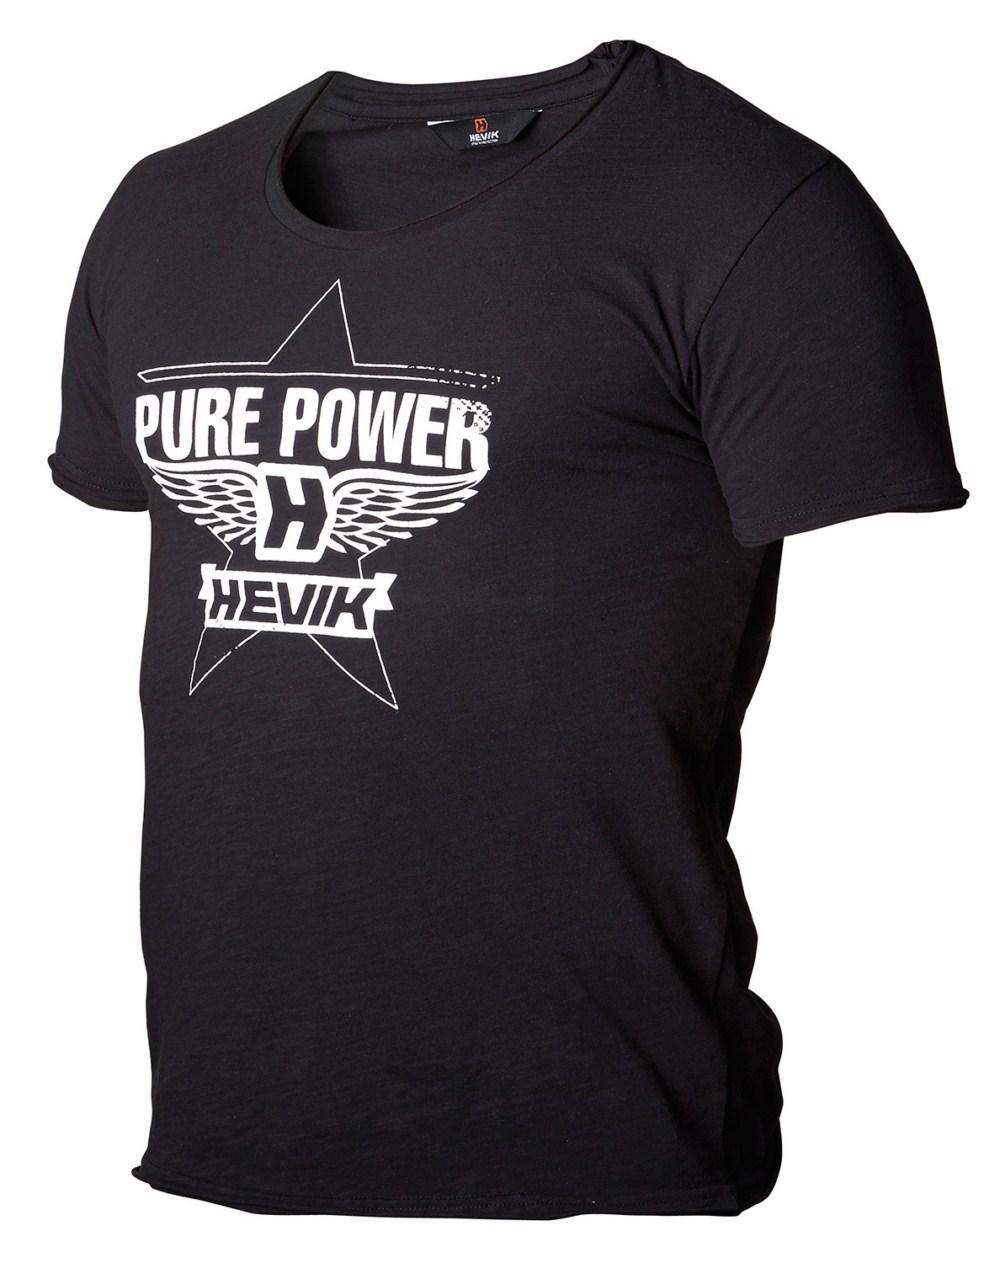 Base layer short sleeves Hevik Black Power